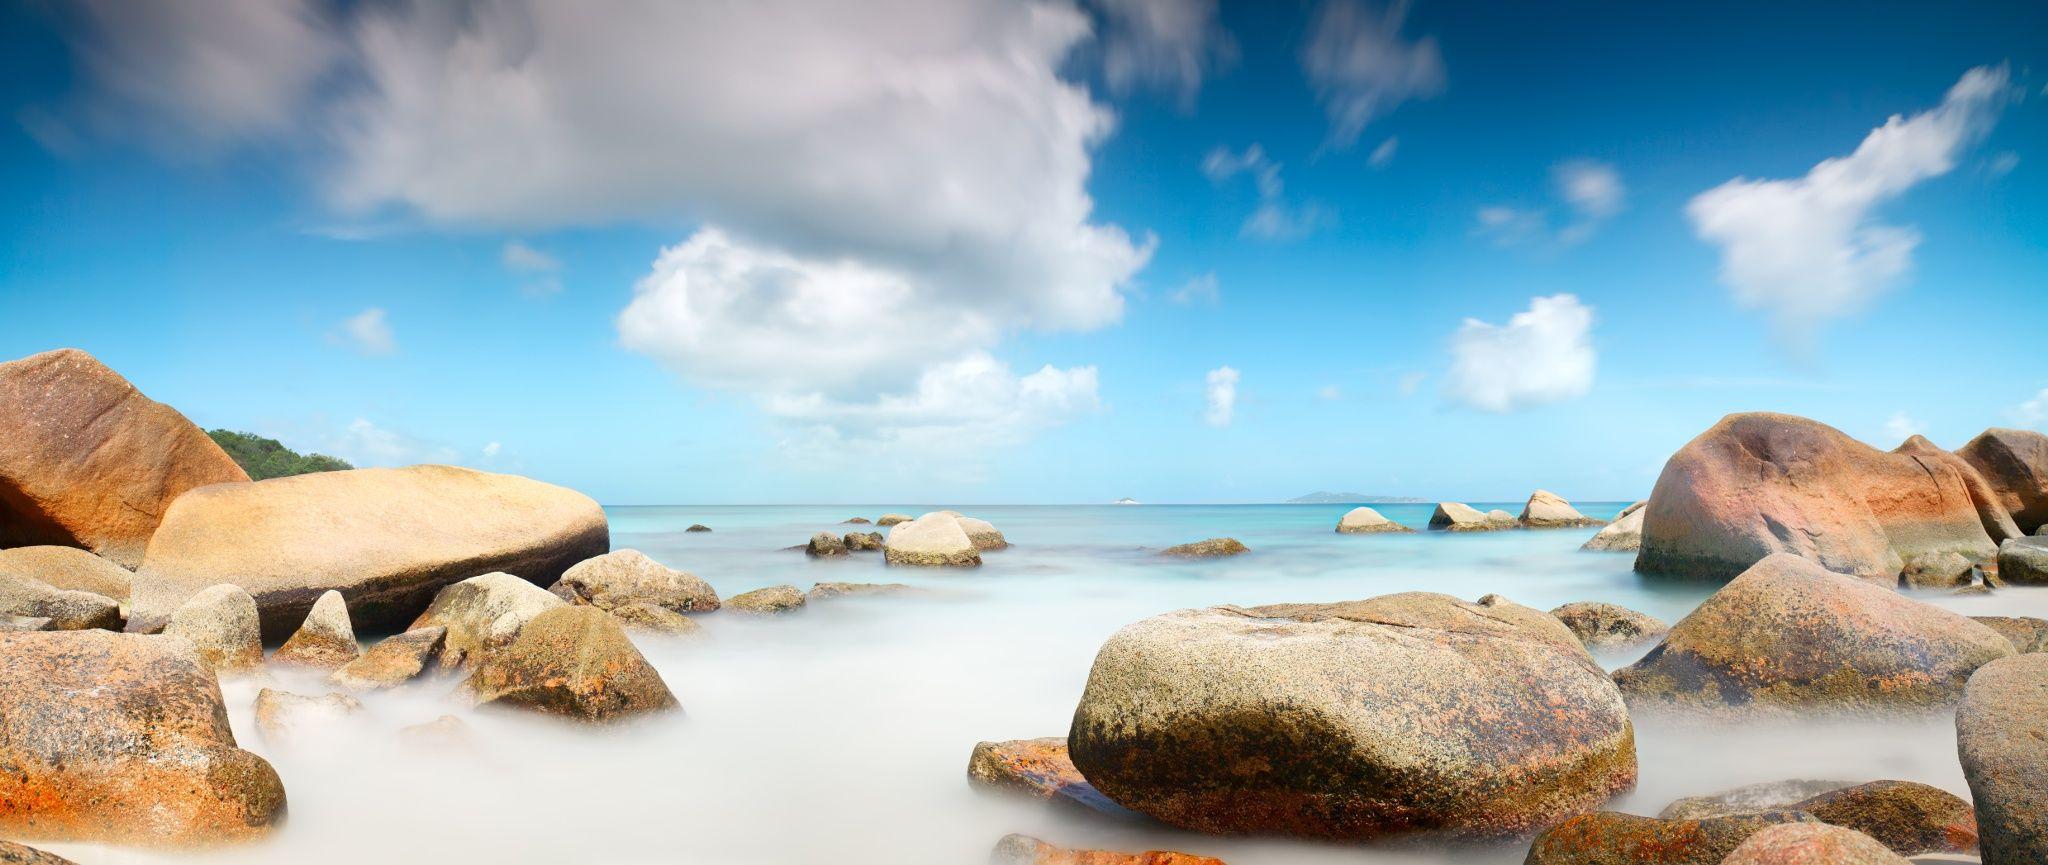 Photograph Seychelles pano by Aleksandr Matveev on 500px